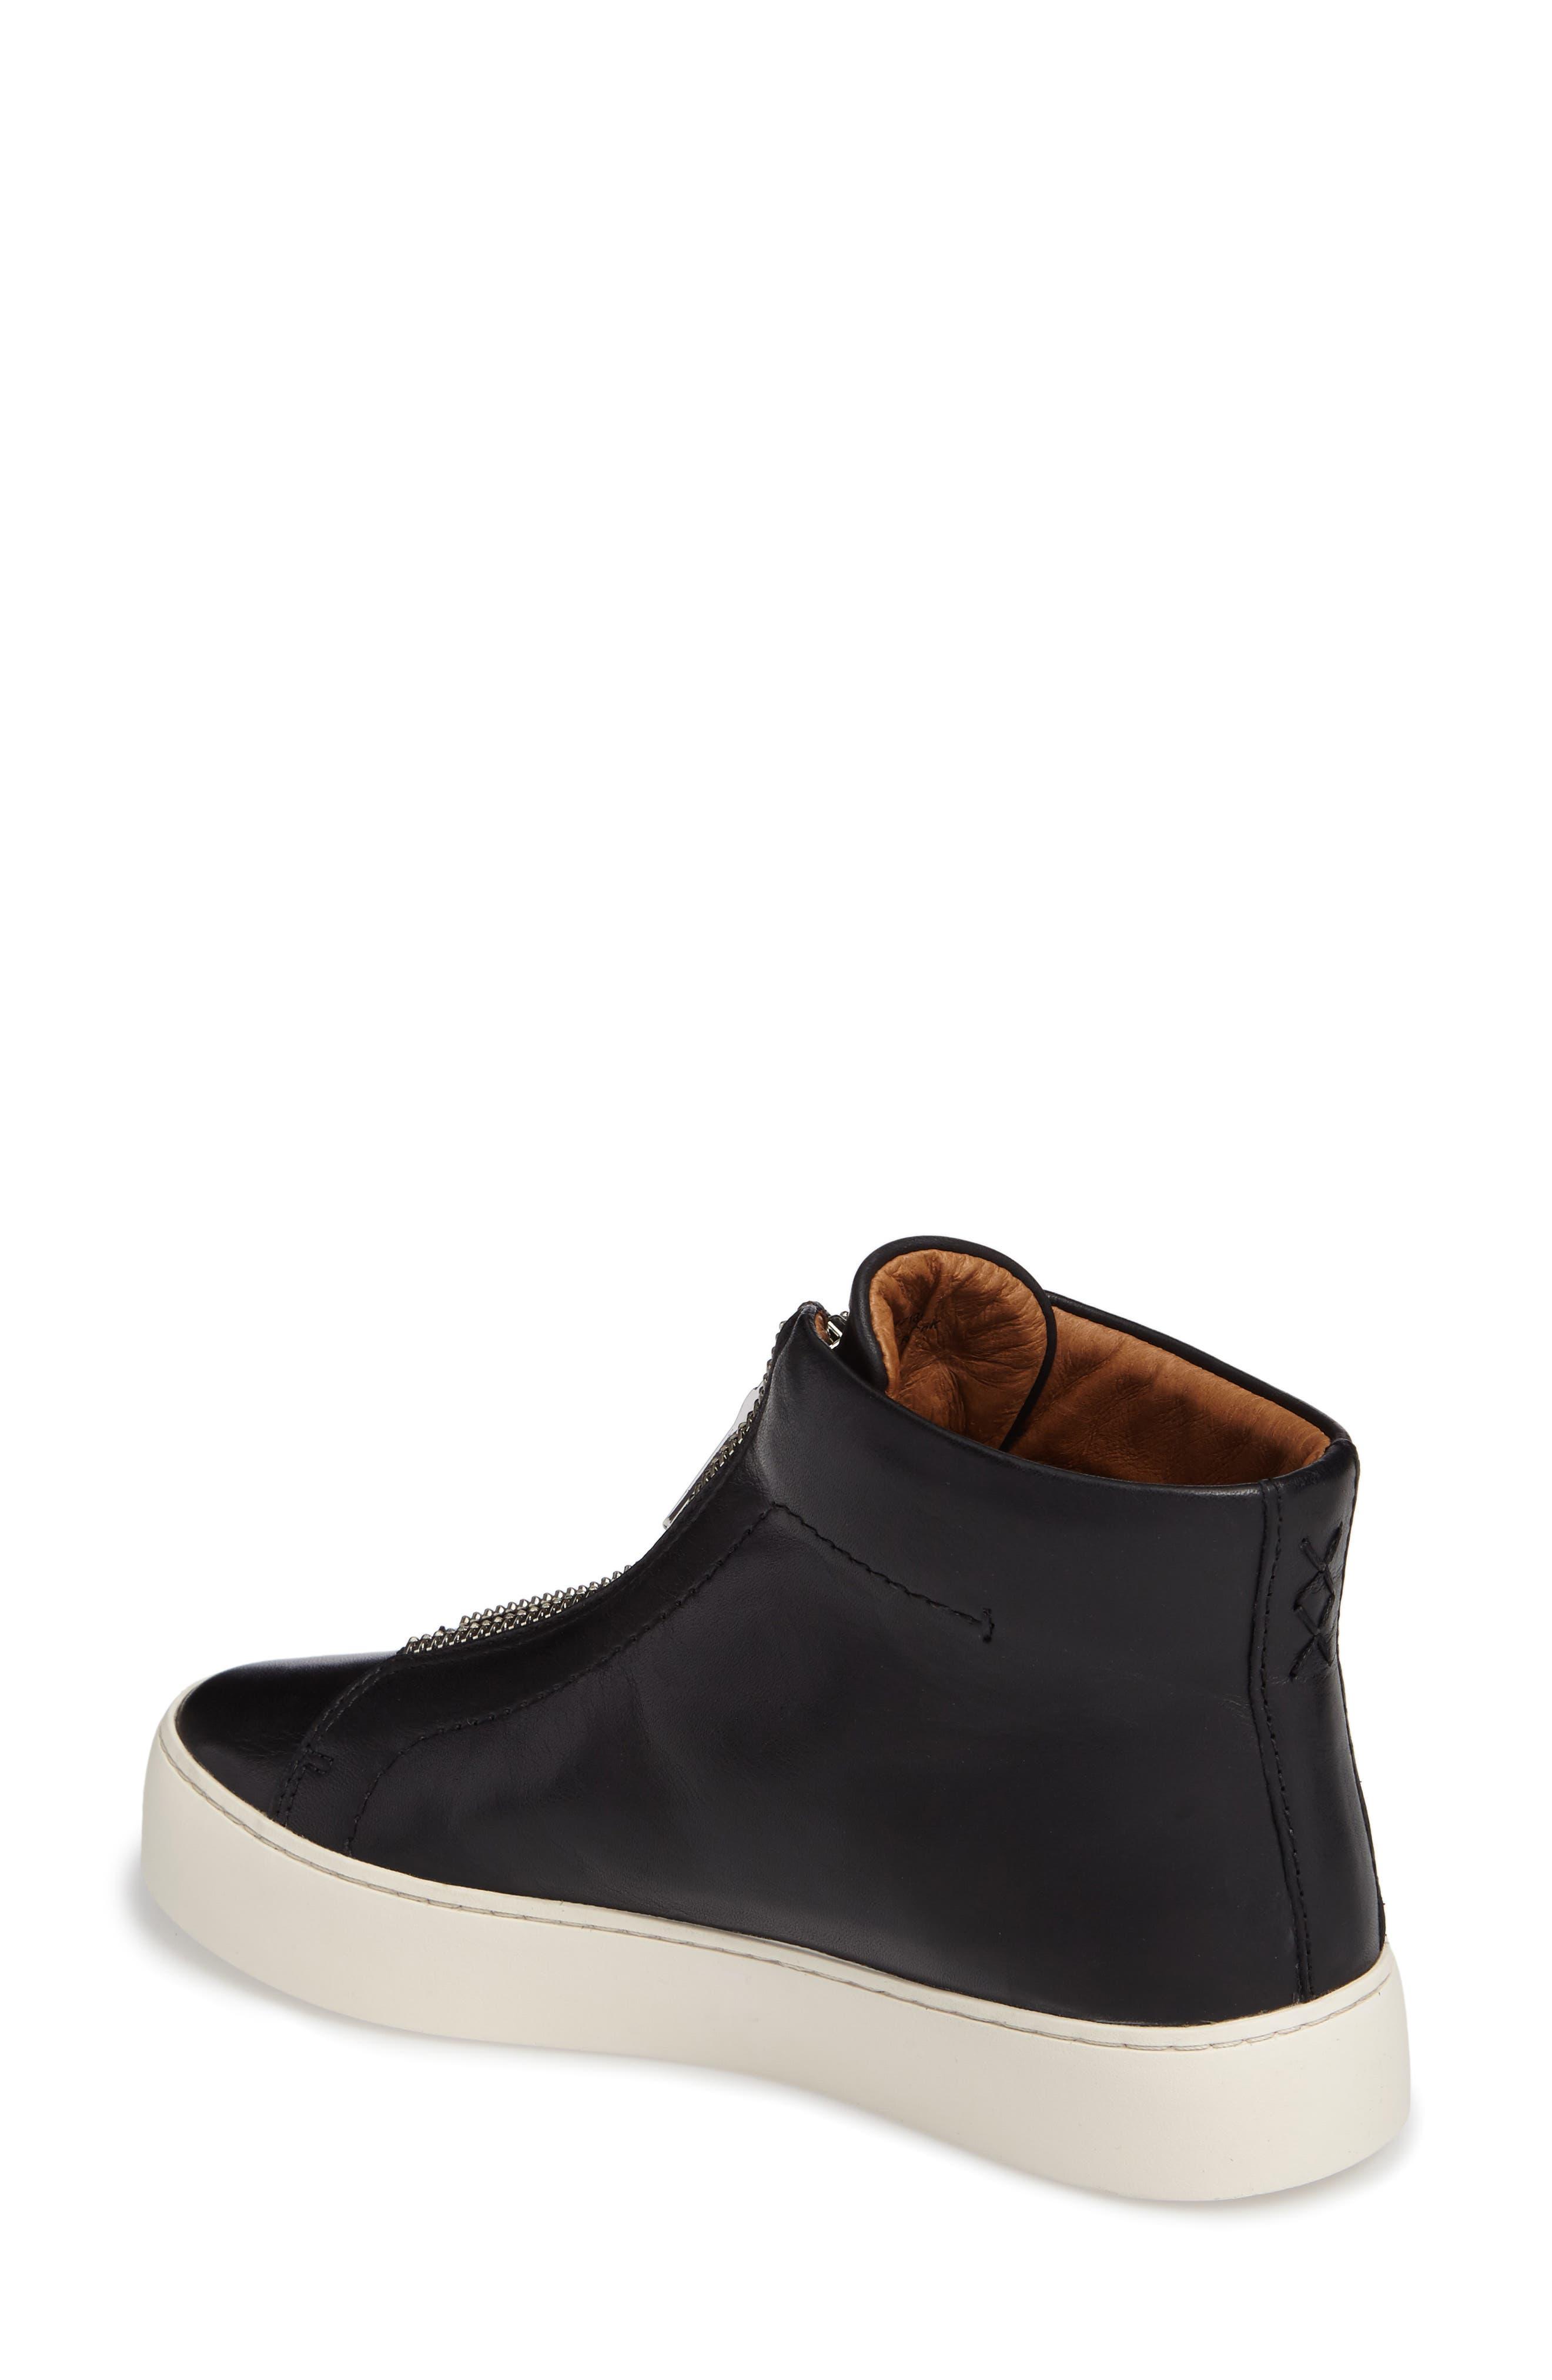 FRYE, Lena Zip High Top Sneaker, Alternate thumbnail 2, color, BLACK LEATHER